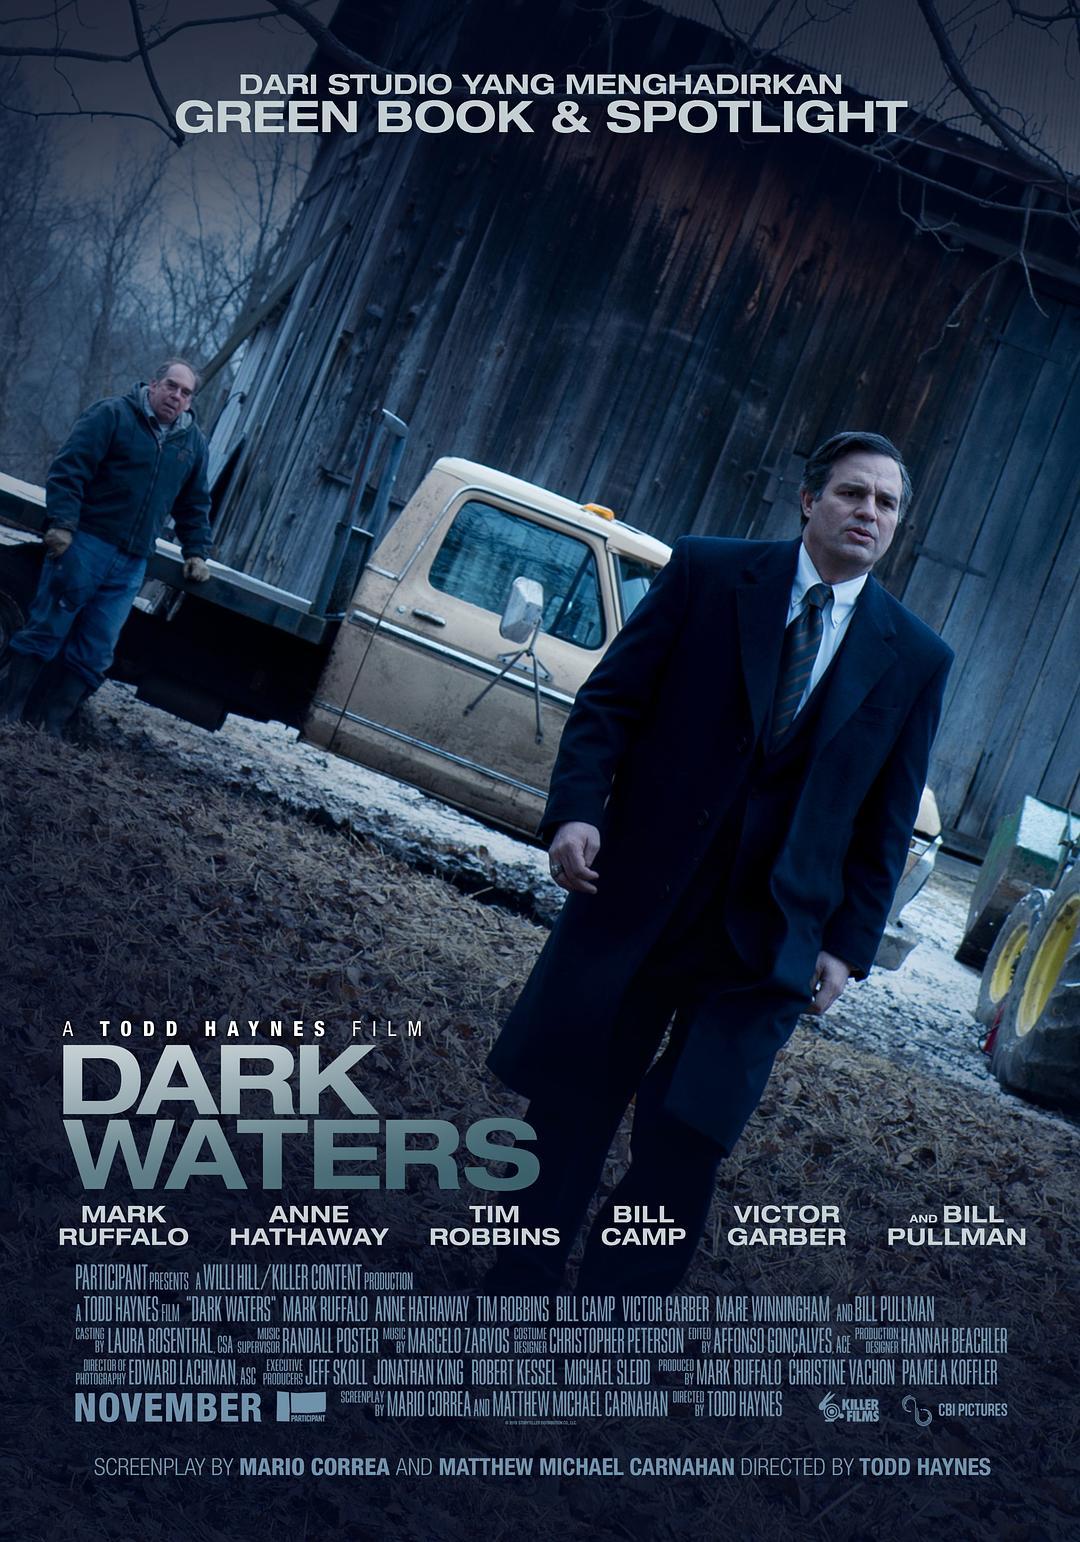 黑水 蓝光原盘下载+高清MKV版/黑水风暴(台) / 黑暗水域 / 空转 / 演习 / Dry Run / The Lawyer Who Became DuPont's Worst Nightmare 2019 Dark Waters 42.2G